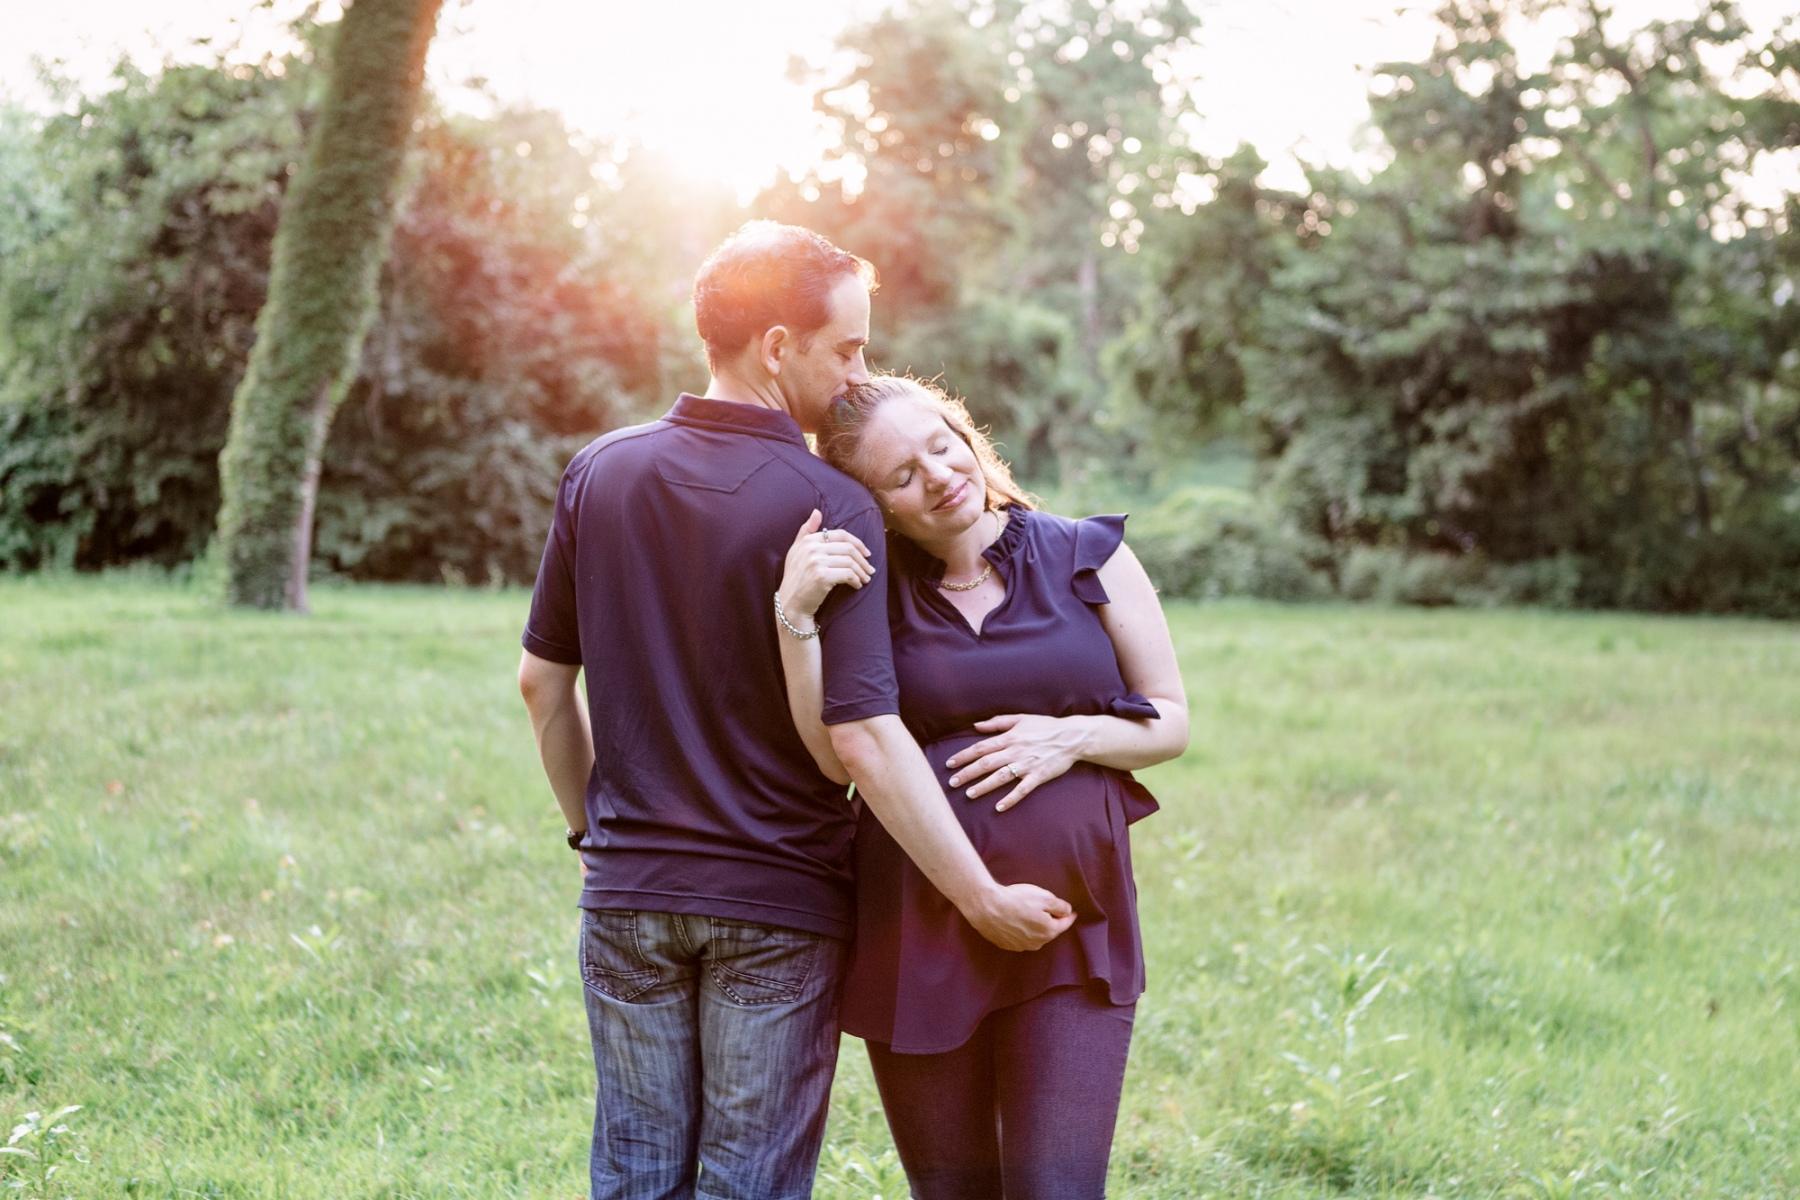 Dating Westchester ny Ladda ner ost äktenskap utan dating k2nblog